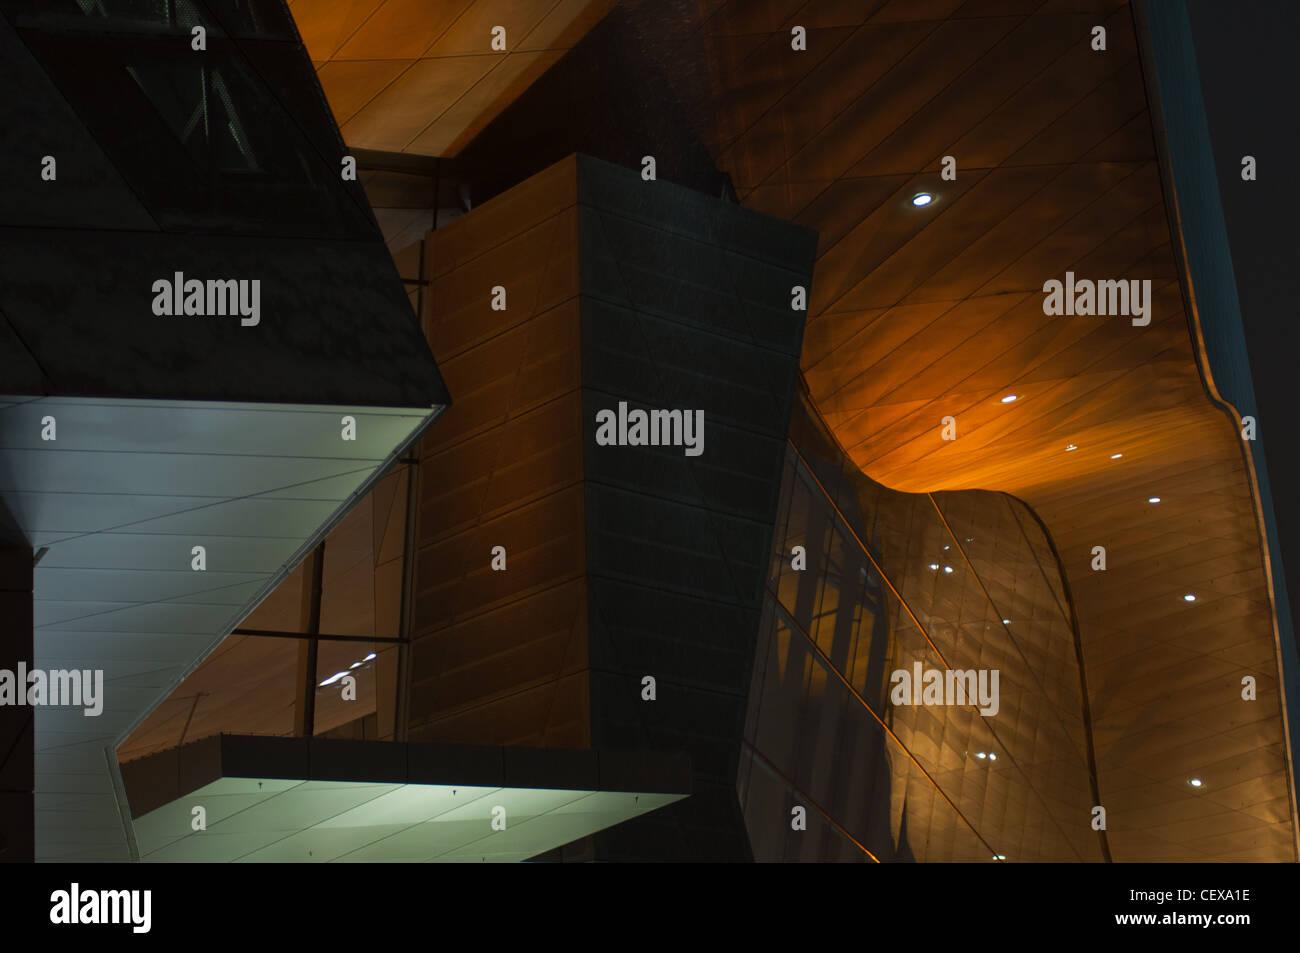 BMW Welt (World) building at night, Munich, Germany. - Stock Image